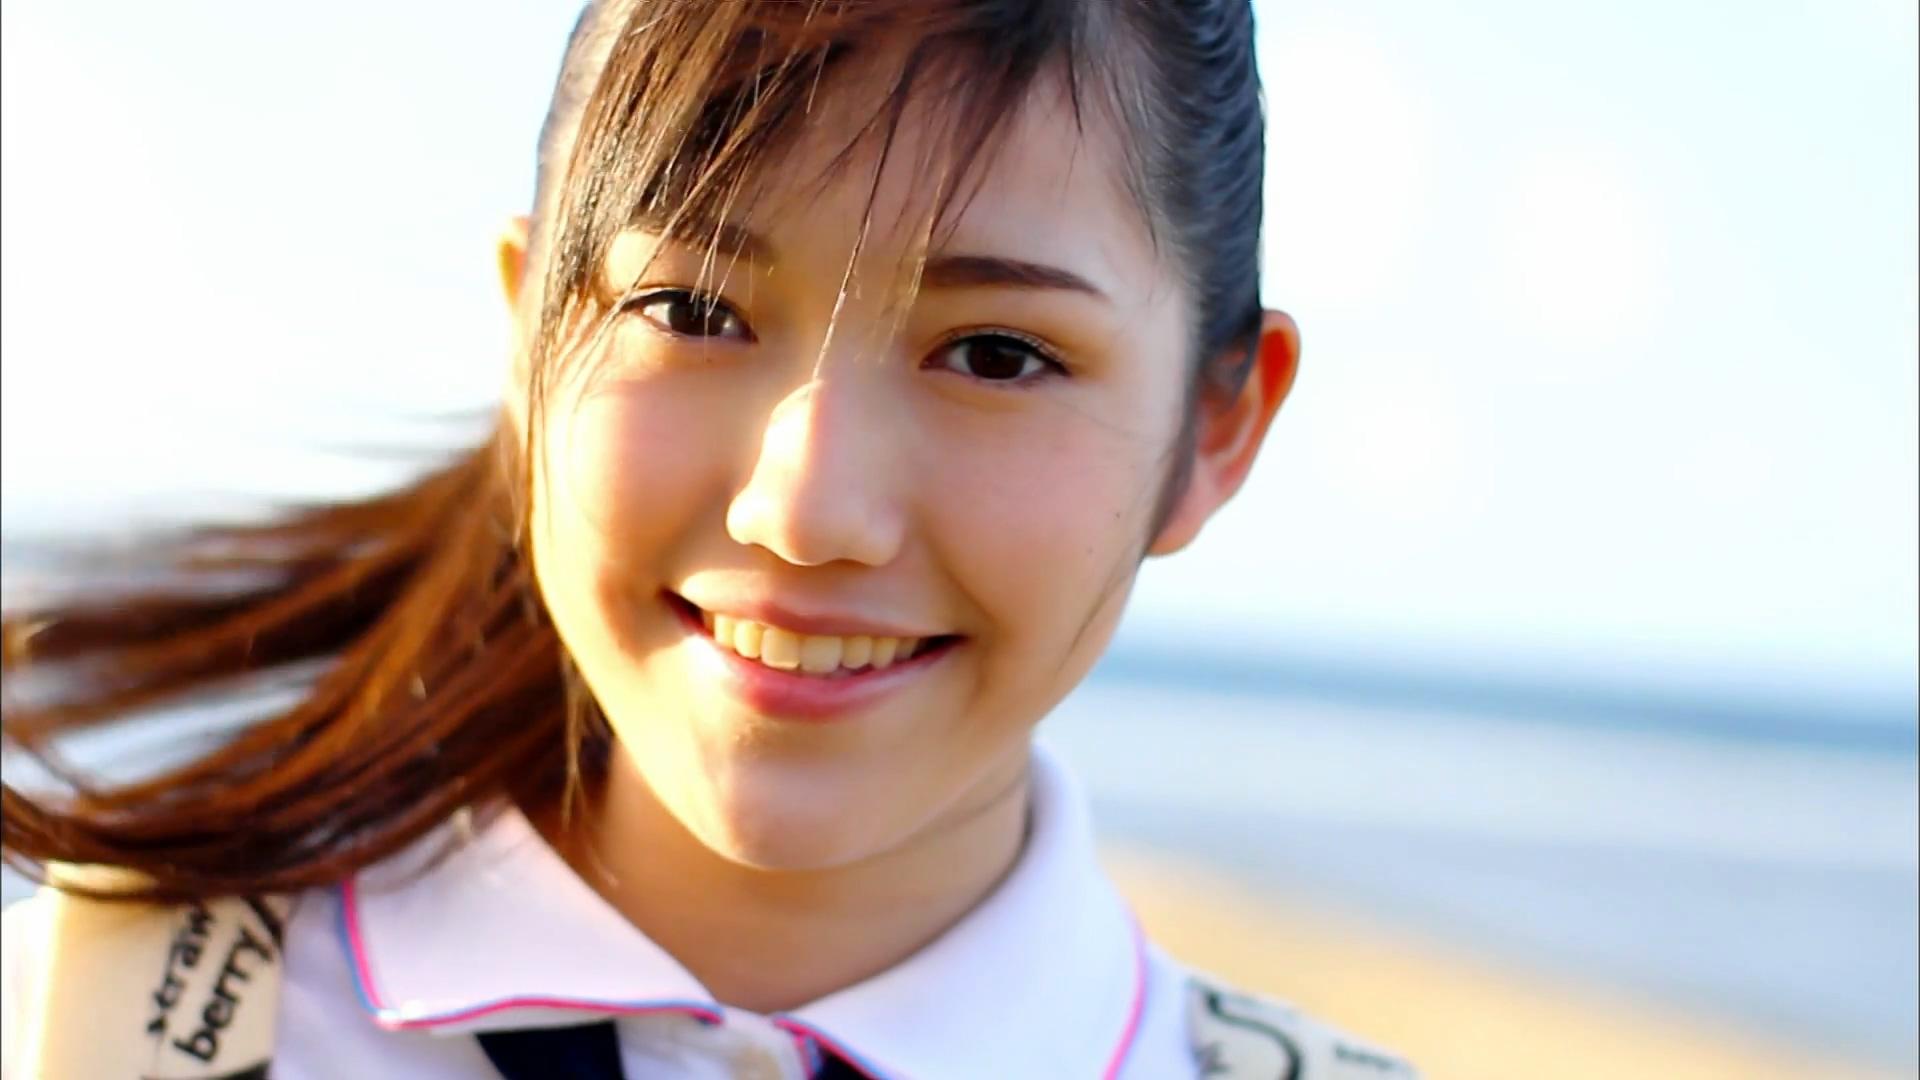 Naisho-Group-Disc-2-Ponytail-to-Chouchou-Music-Video-1080p-x264-mp4-20200206-102738-367